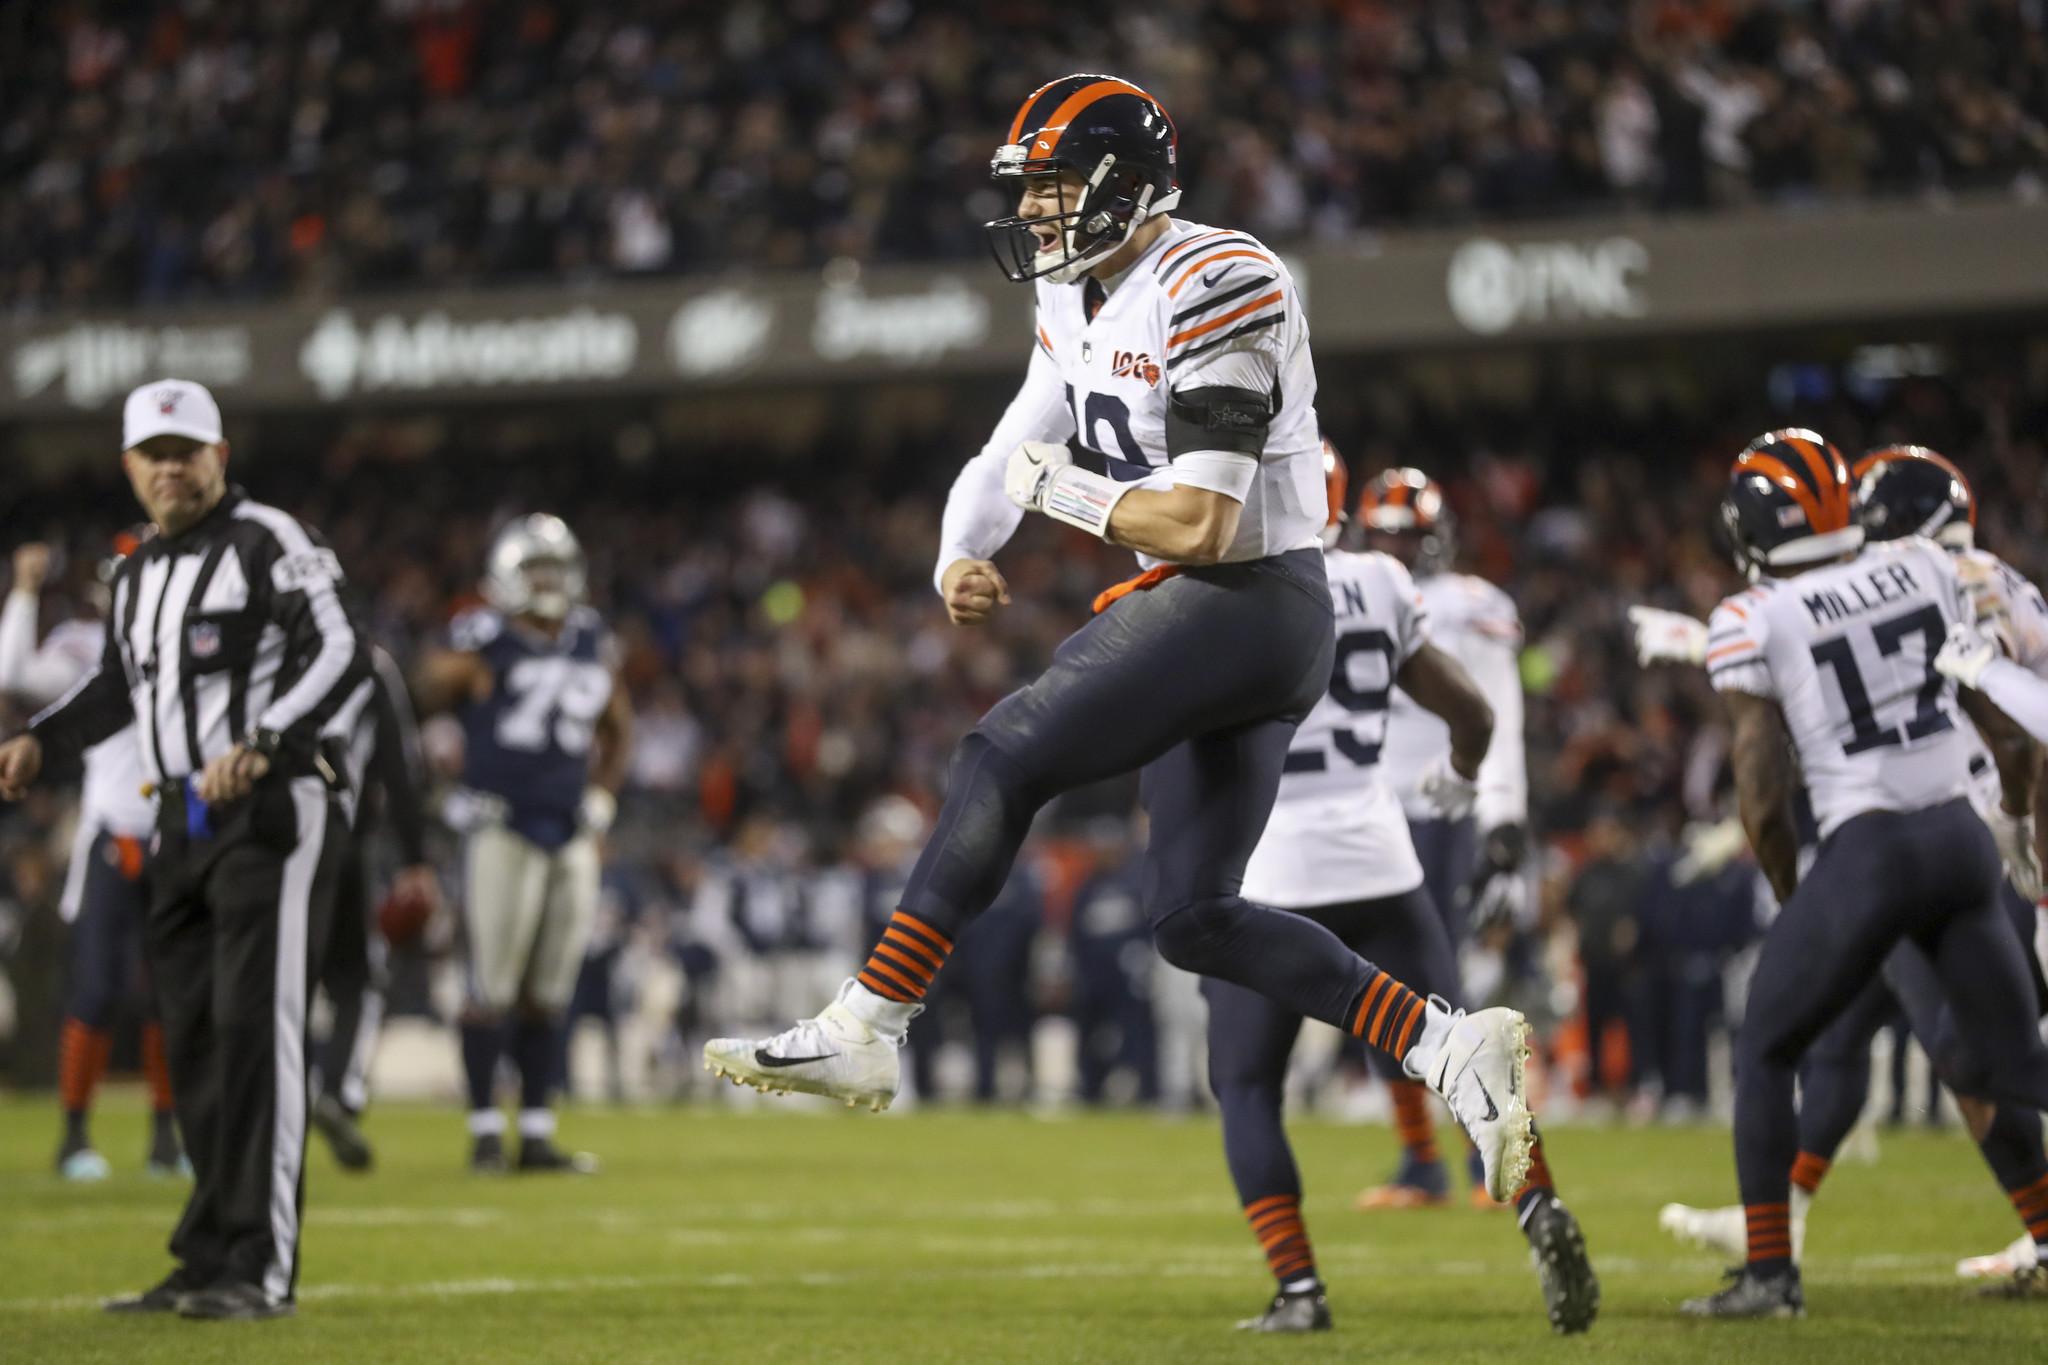 Week 14 recap: Chicago Bears beat Dallas Cowboys 31-24 - Chicago Tribune